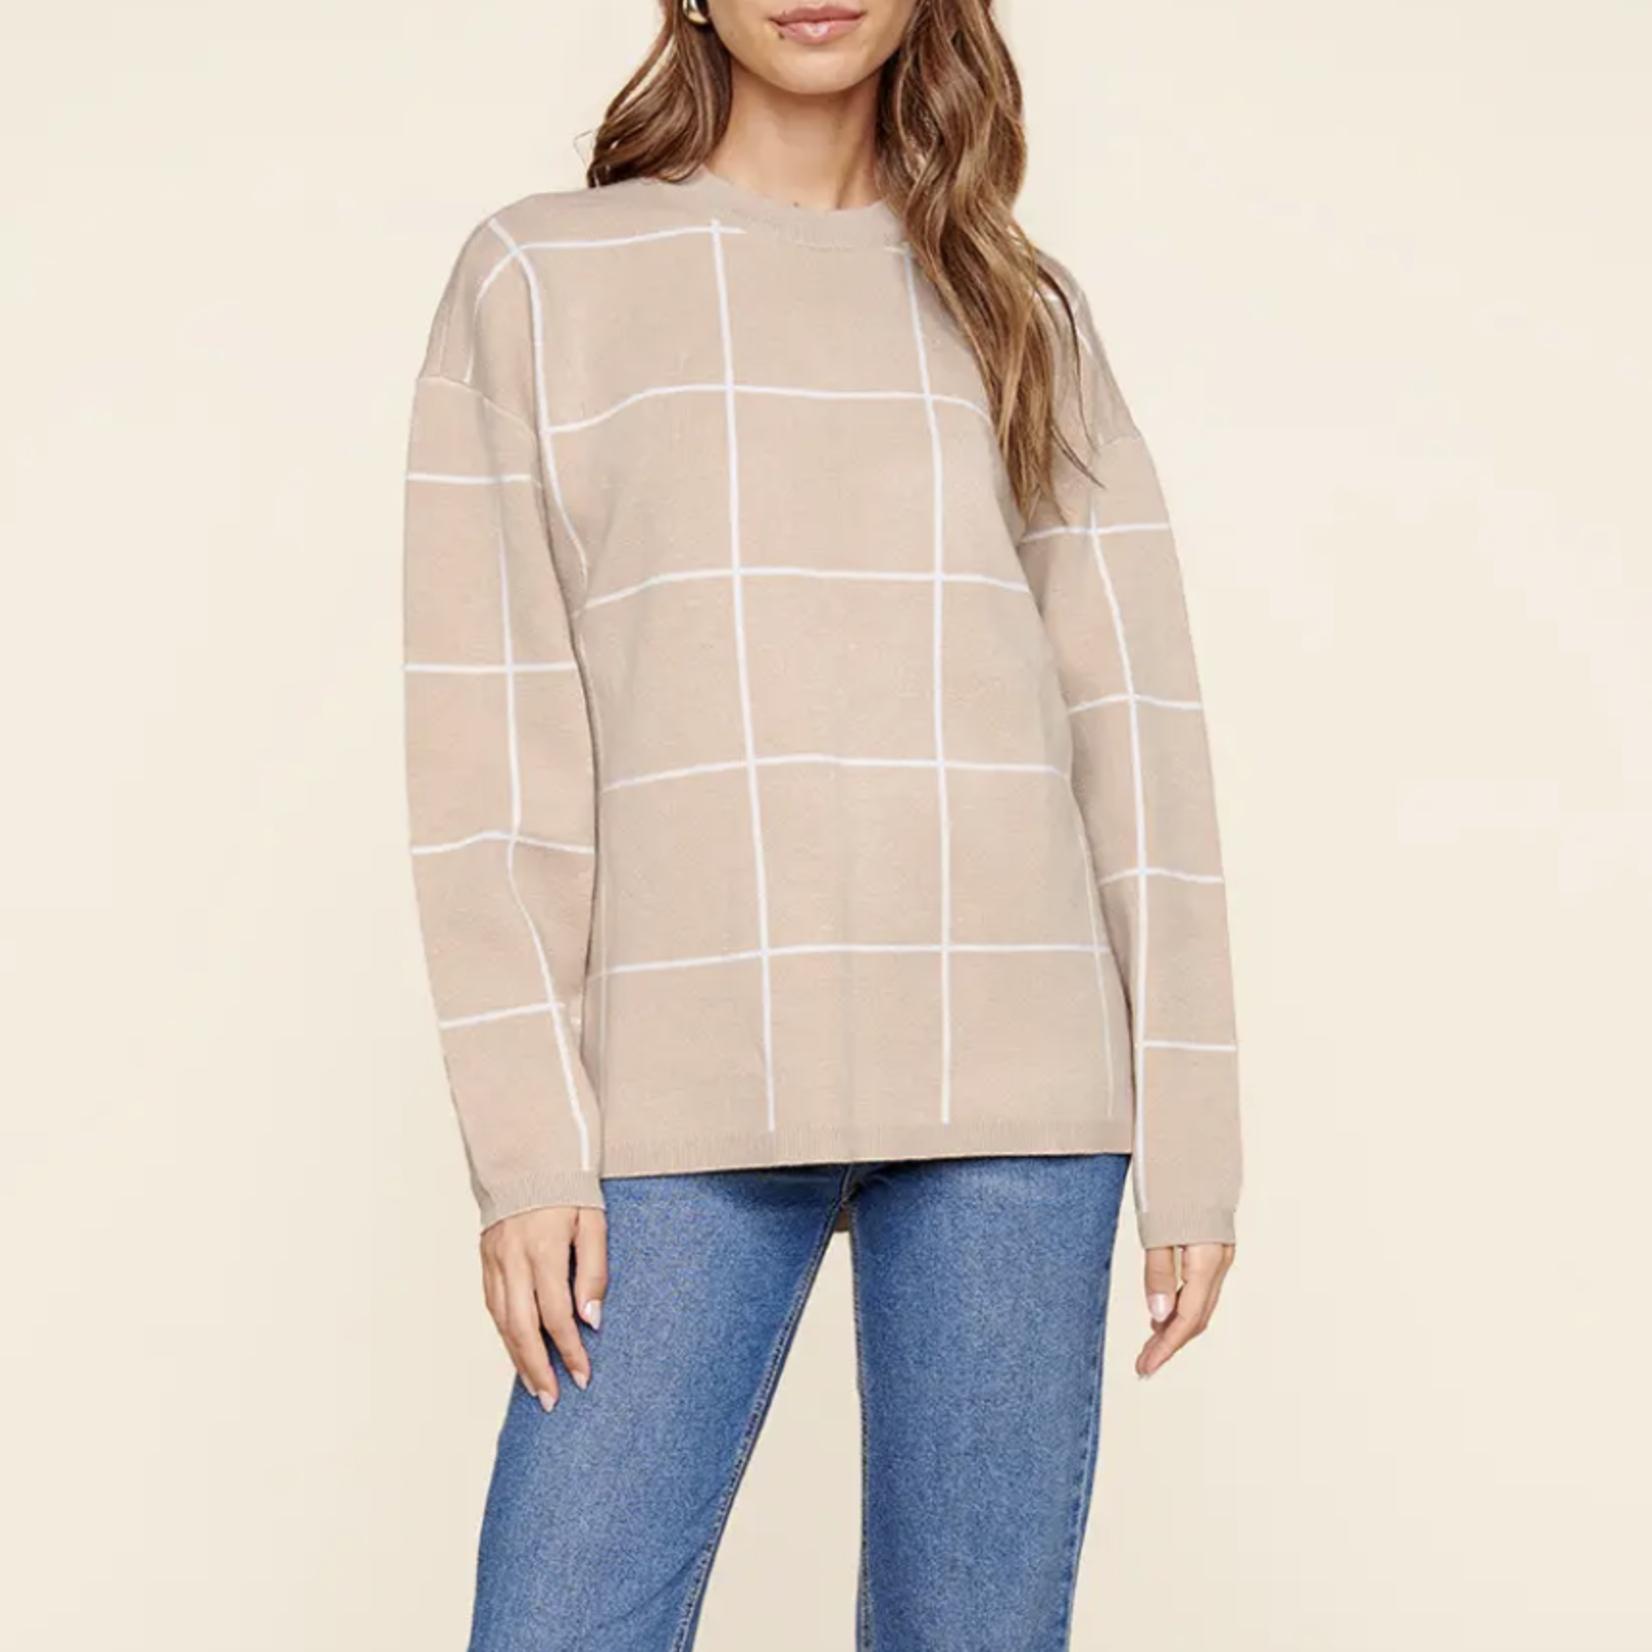 Indigo Faire Dansby Window Pane Sweater